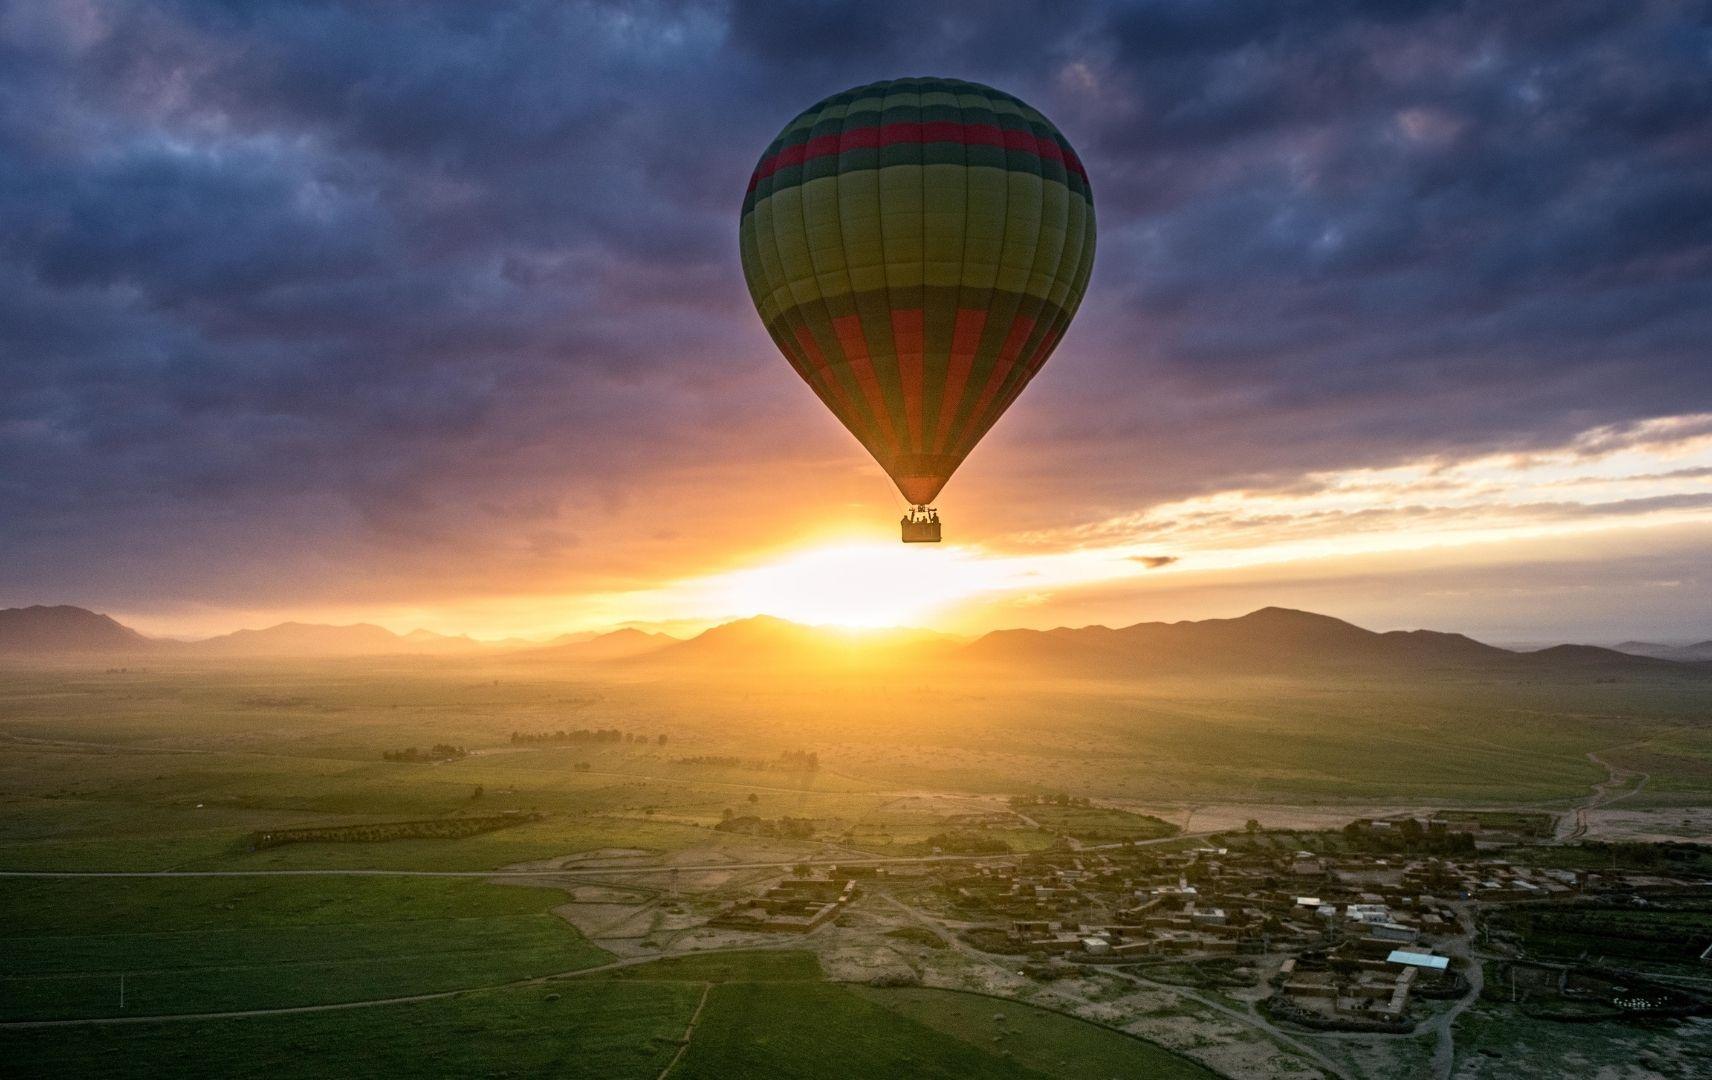 Marrakesch Fahrt mit dem Heißluftballon